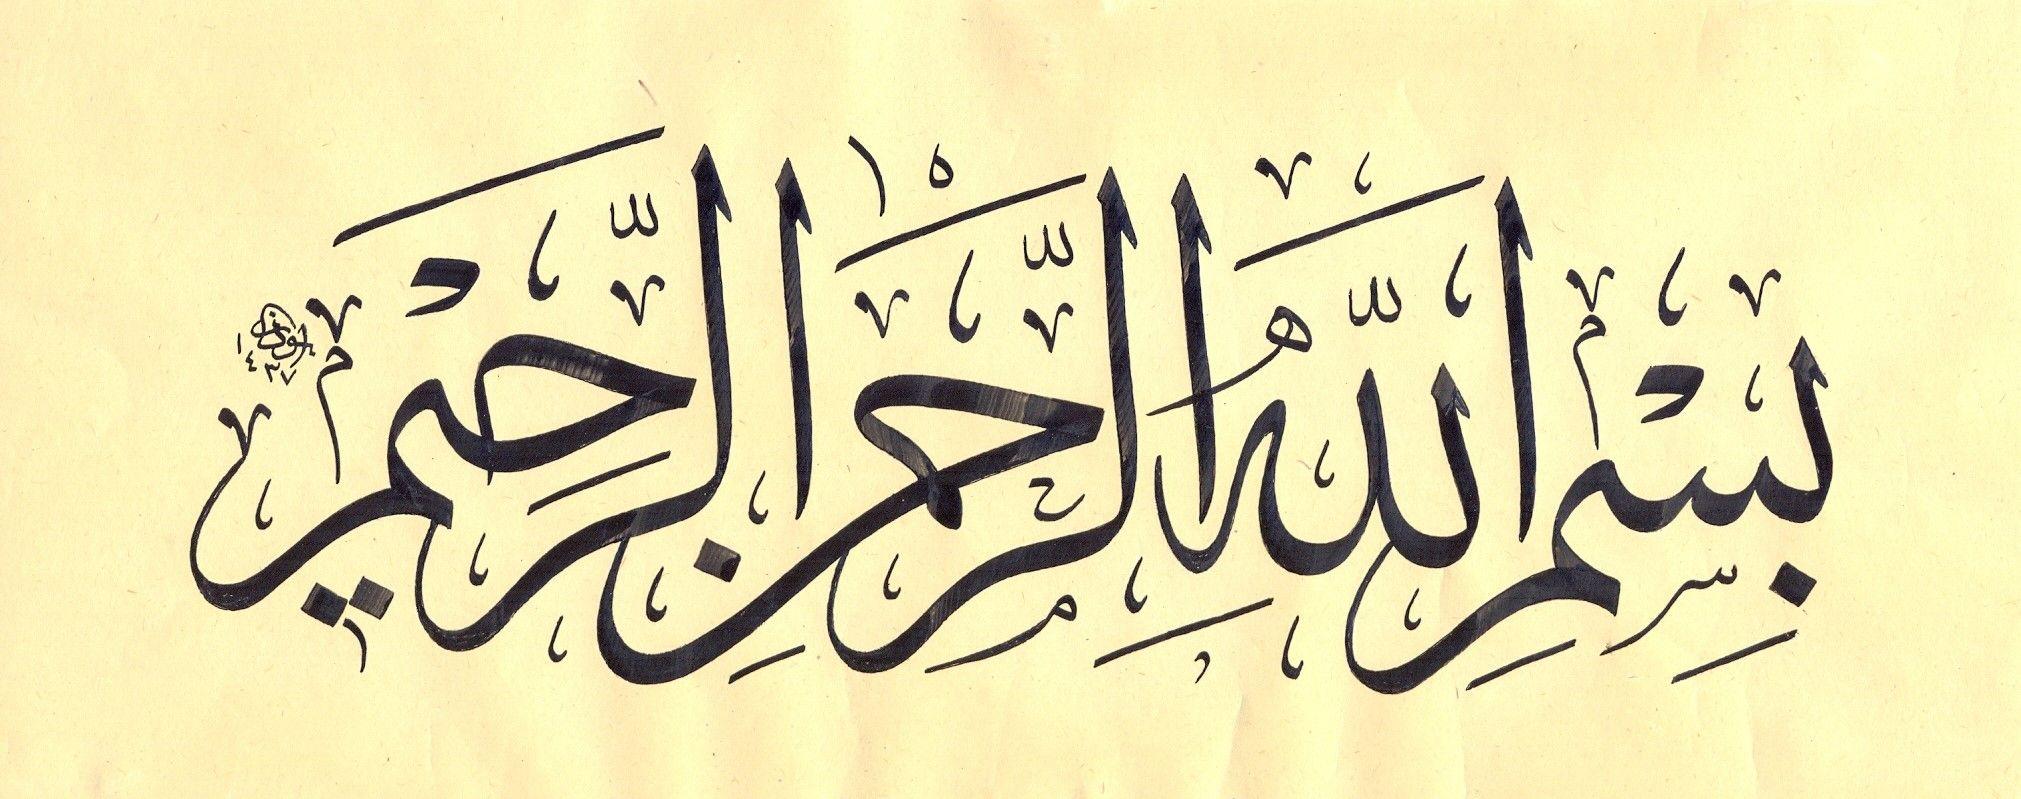 Bismillahirrahmanirrahim Islamic art calligraphy